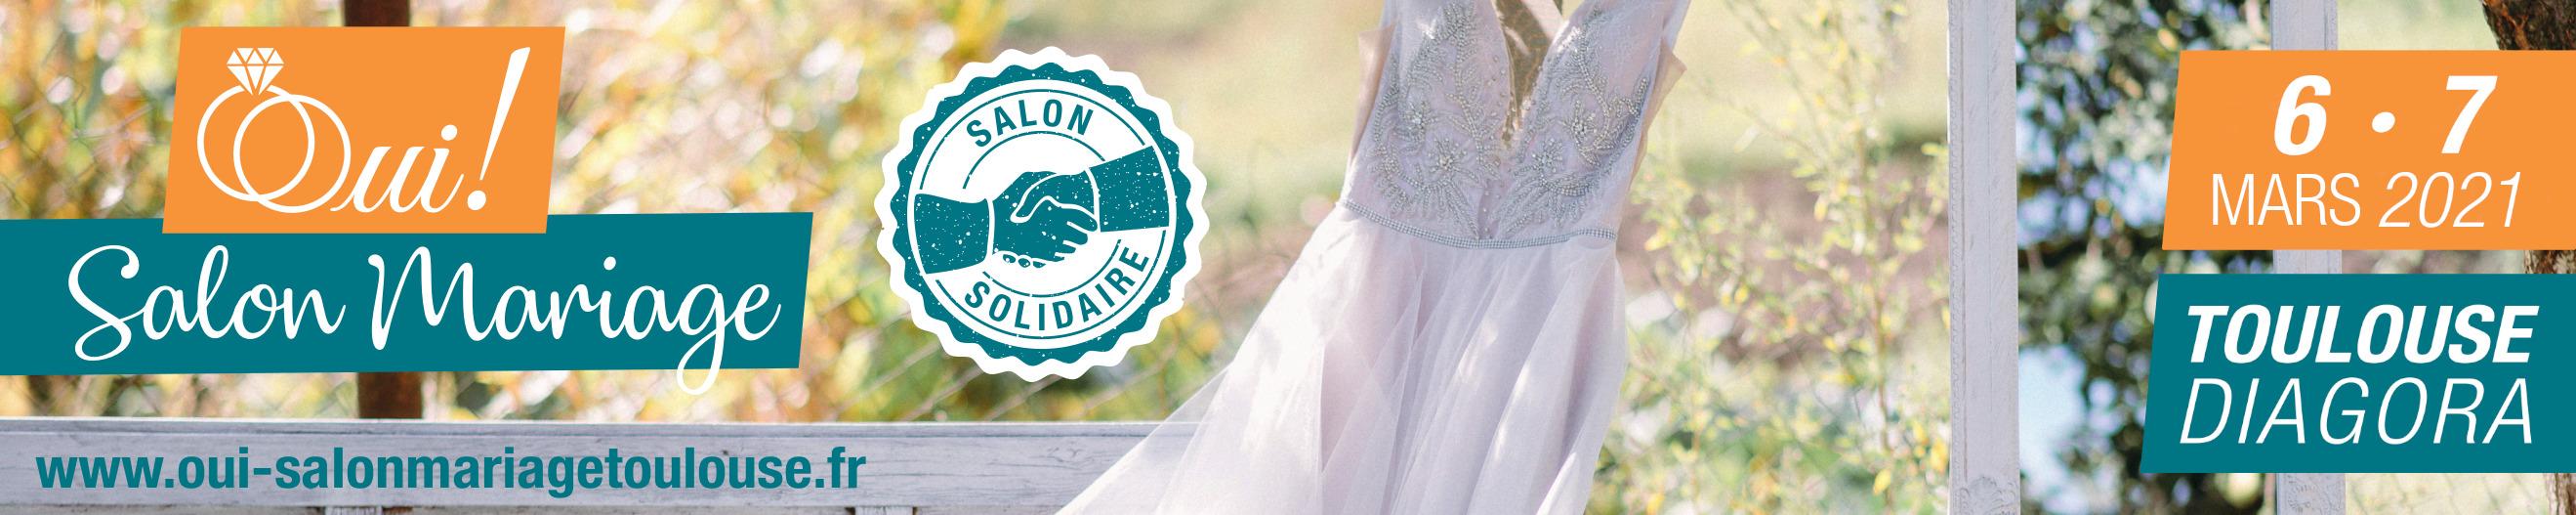 Bandeau Oui ! Salon Mariage 2021